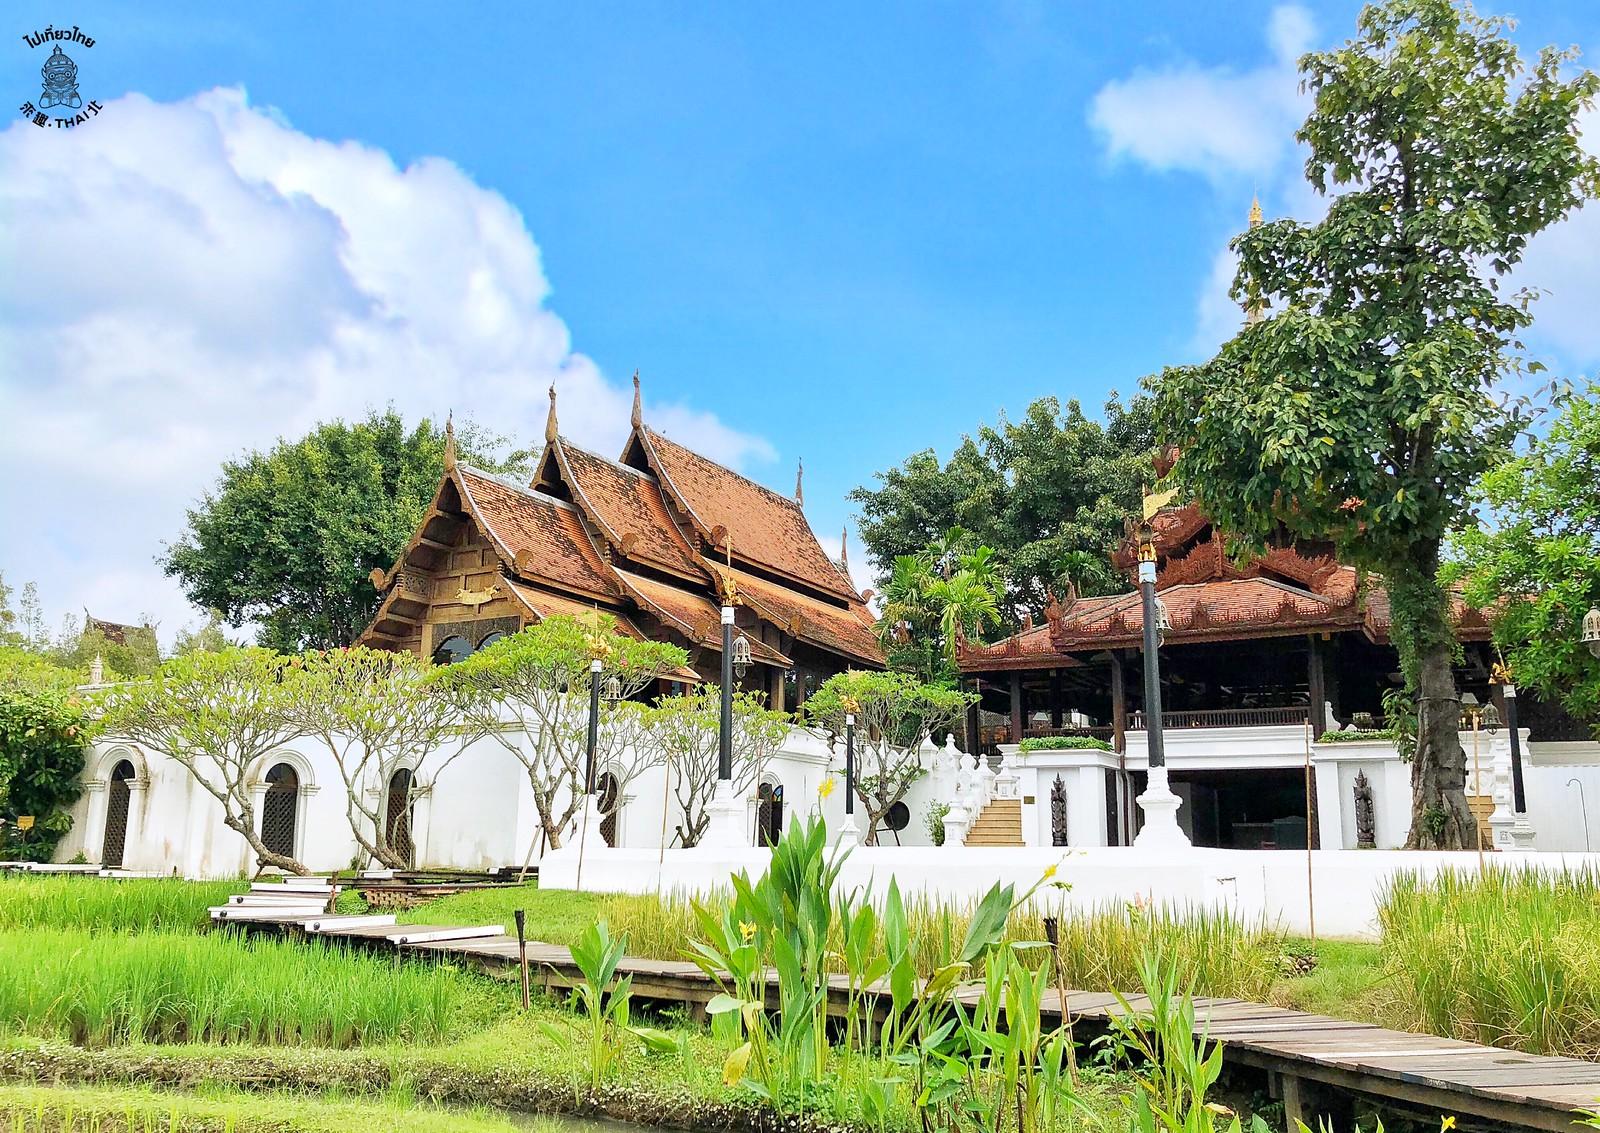 Dhara Dhevi Chiang Mai獨棟柚木Villa住宿